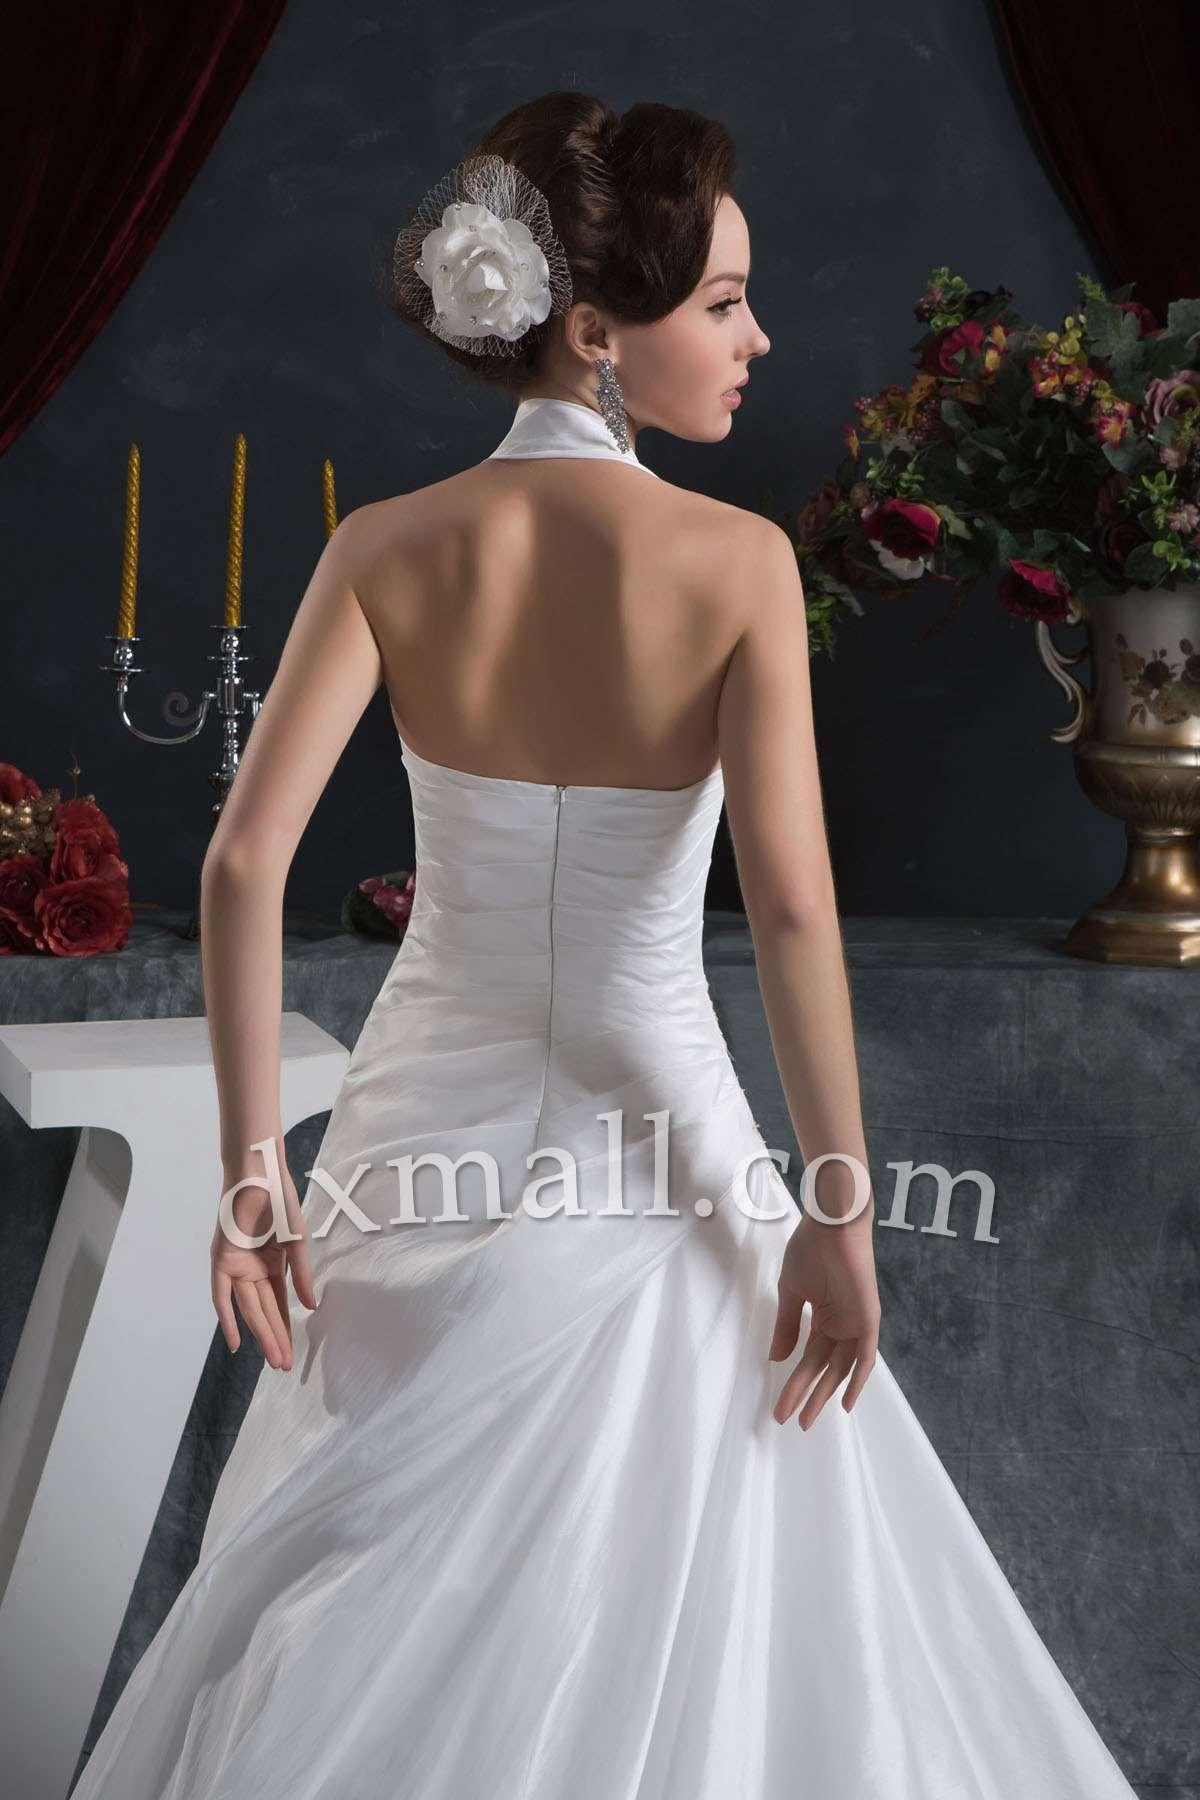 Dropped waist wedding dress  Drop Waist Wedding Dresses Halter Court Train Taffeta Satin Ivory